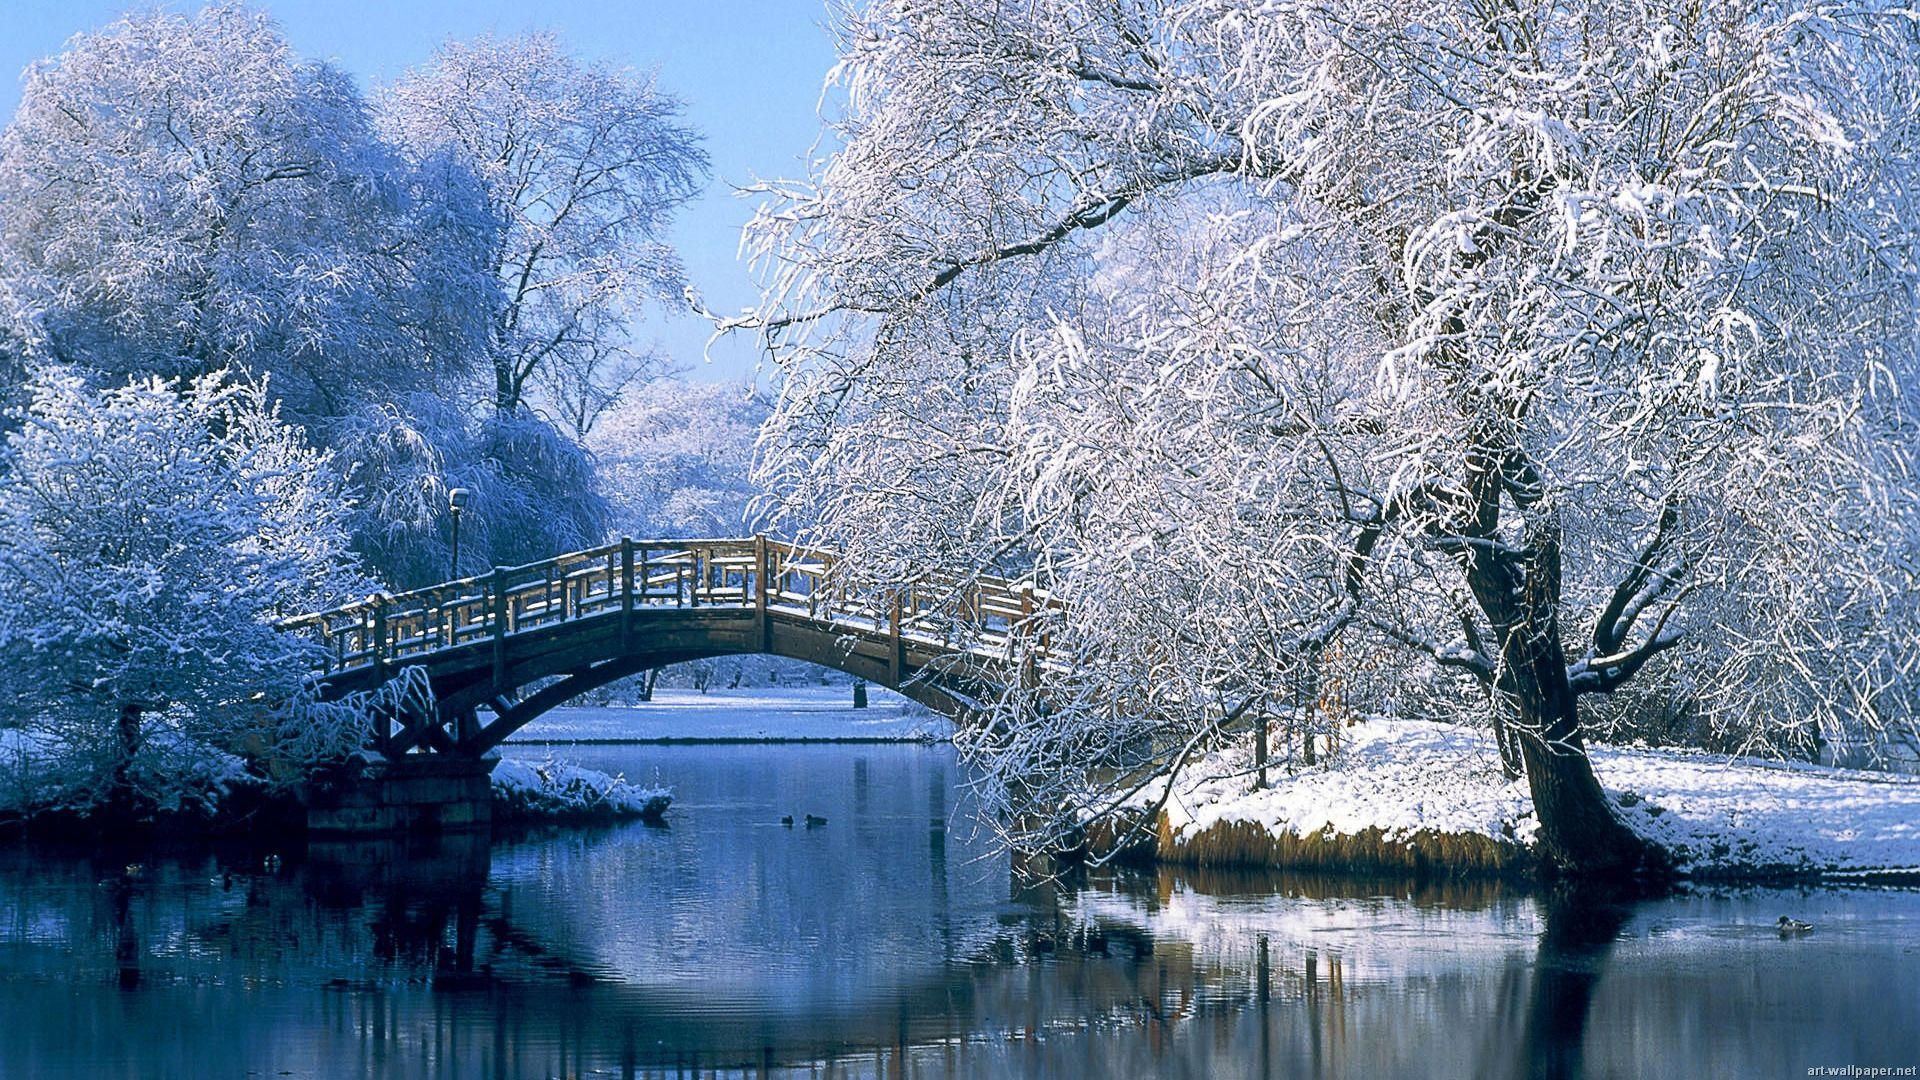 Japan hd desktop wallpapers japan hd desktop images - Wallpaper hd nature winter ...